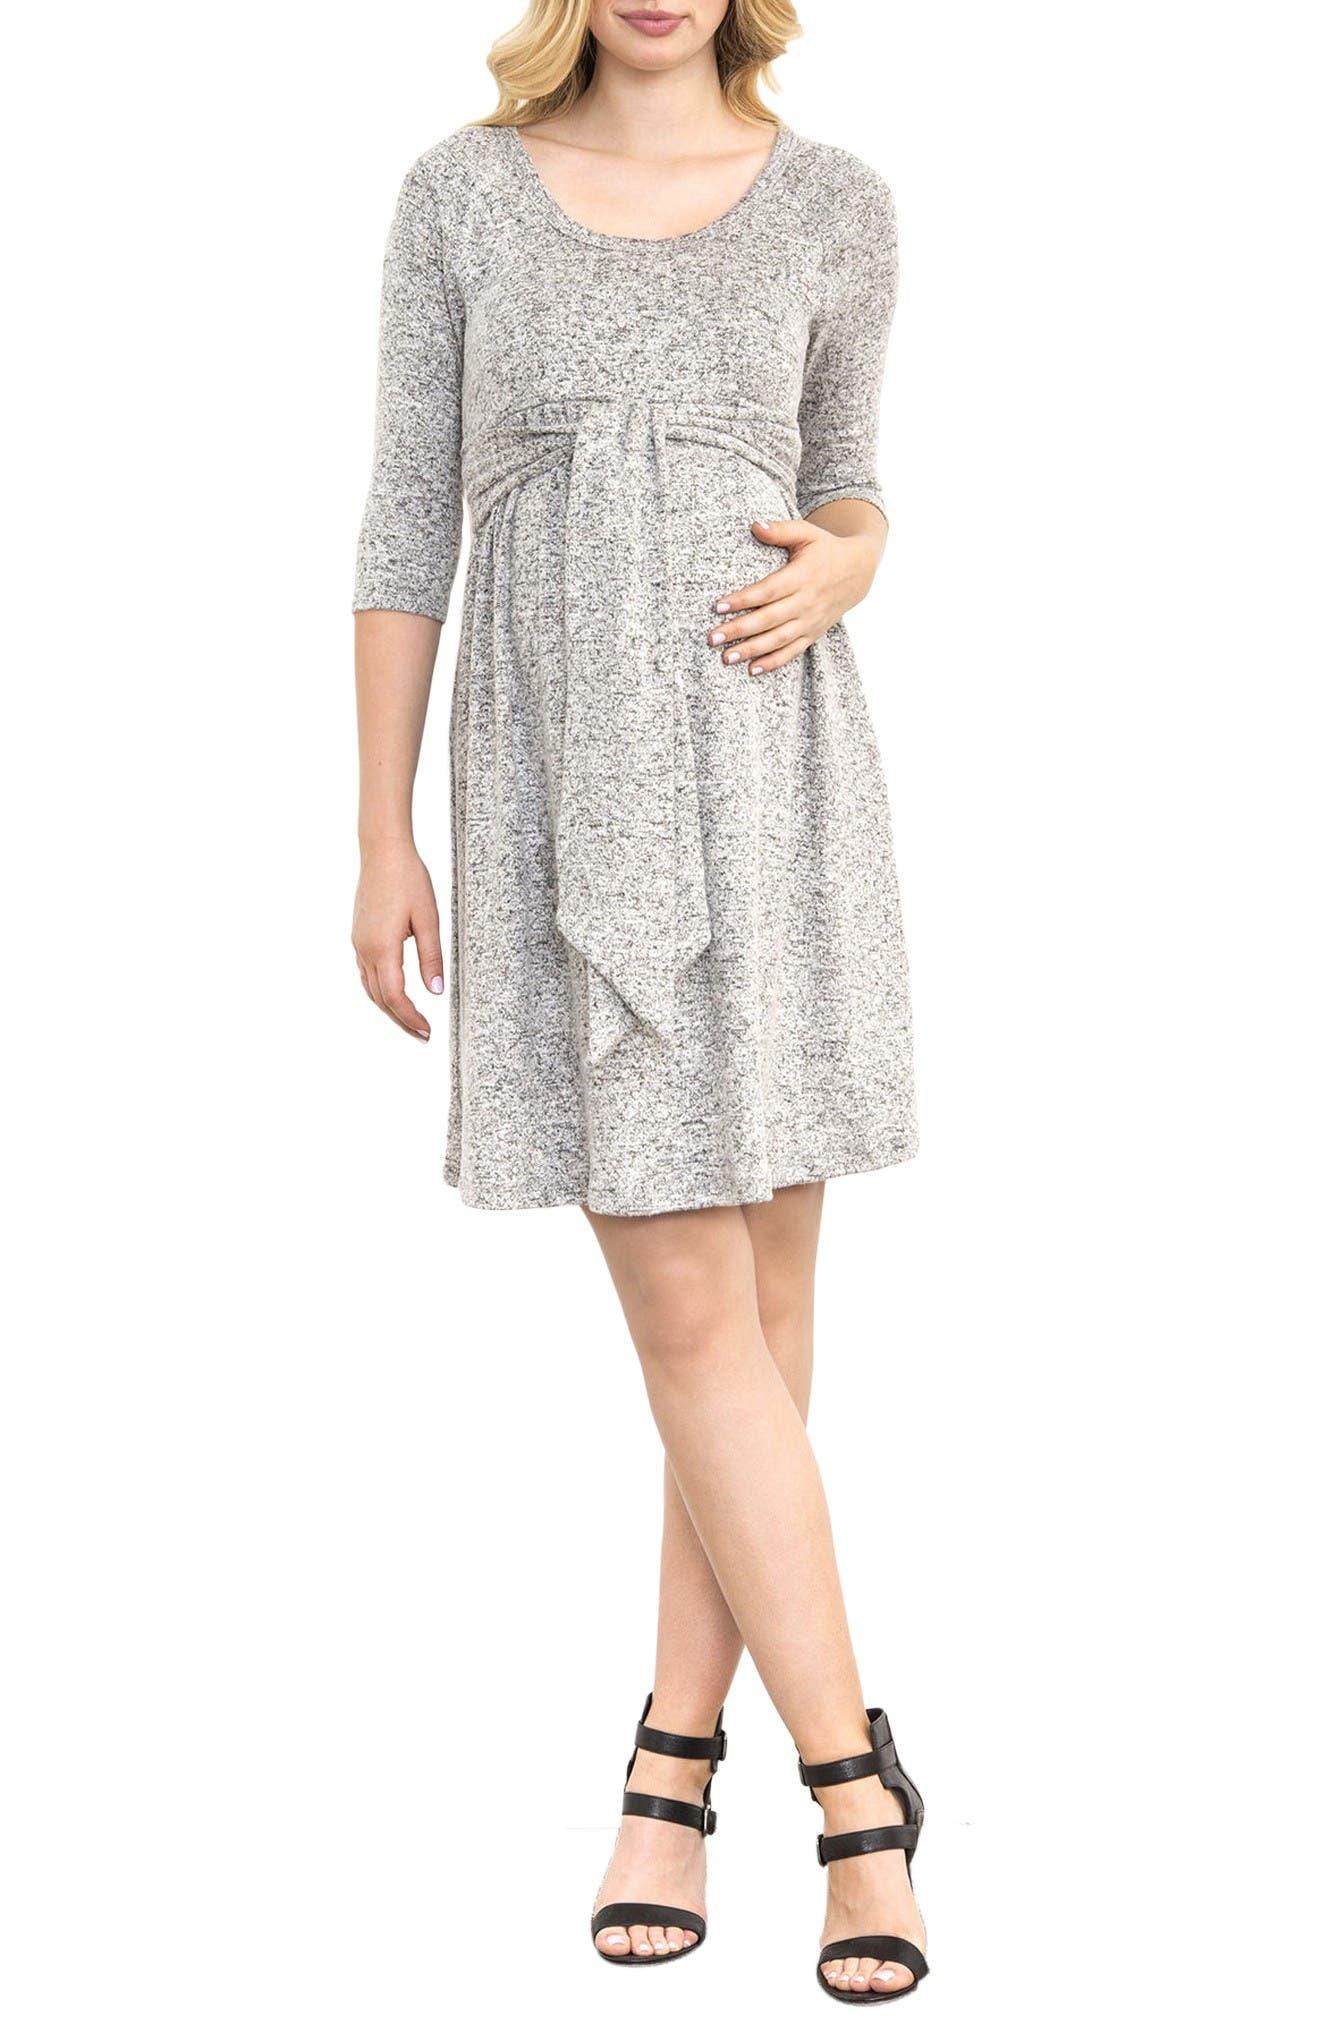 Scoop Neck Maternity Dress,                         Main,                         color, Grey